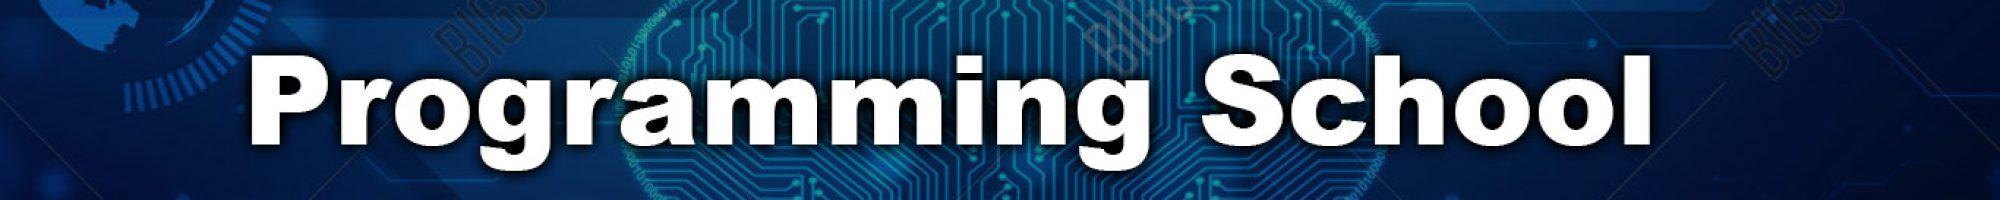 course-bannersProgramming-School